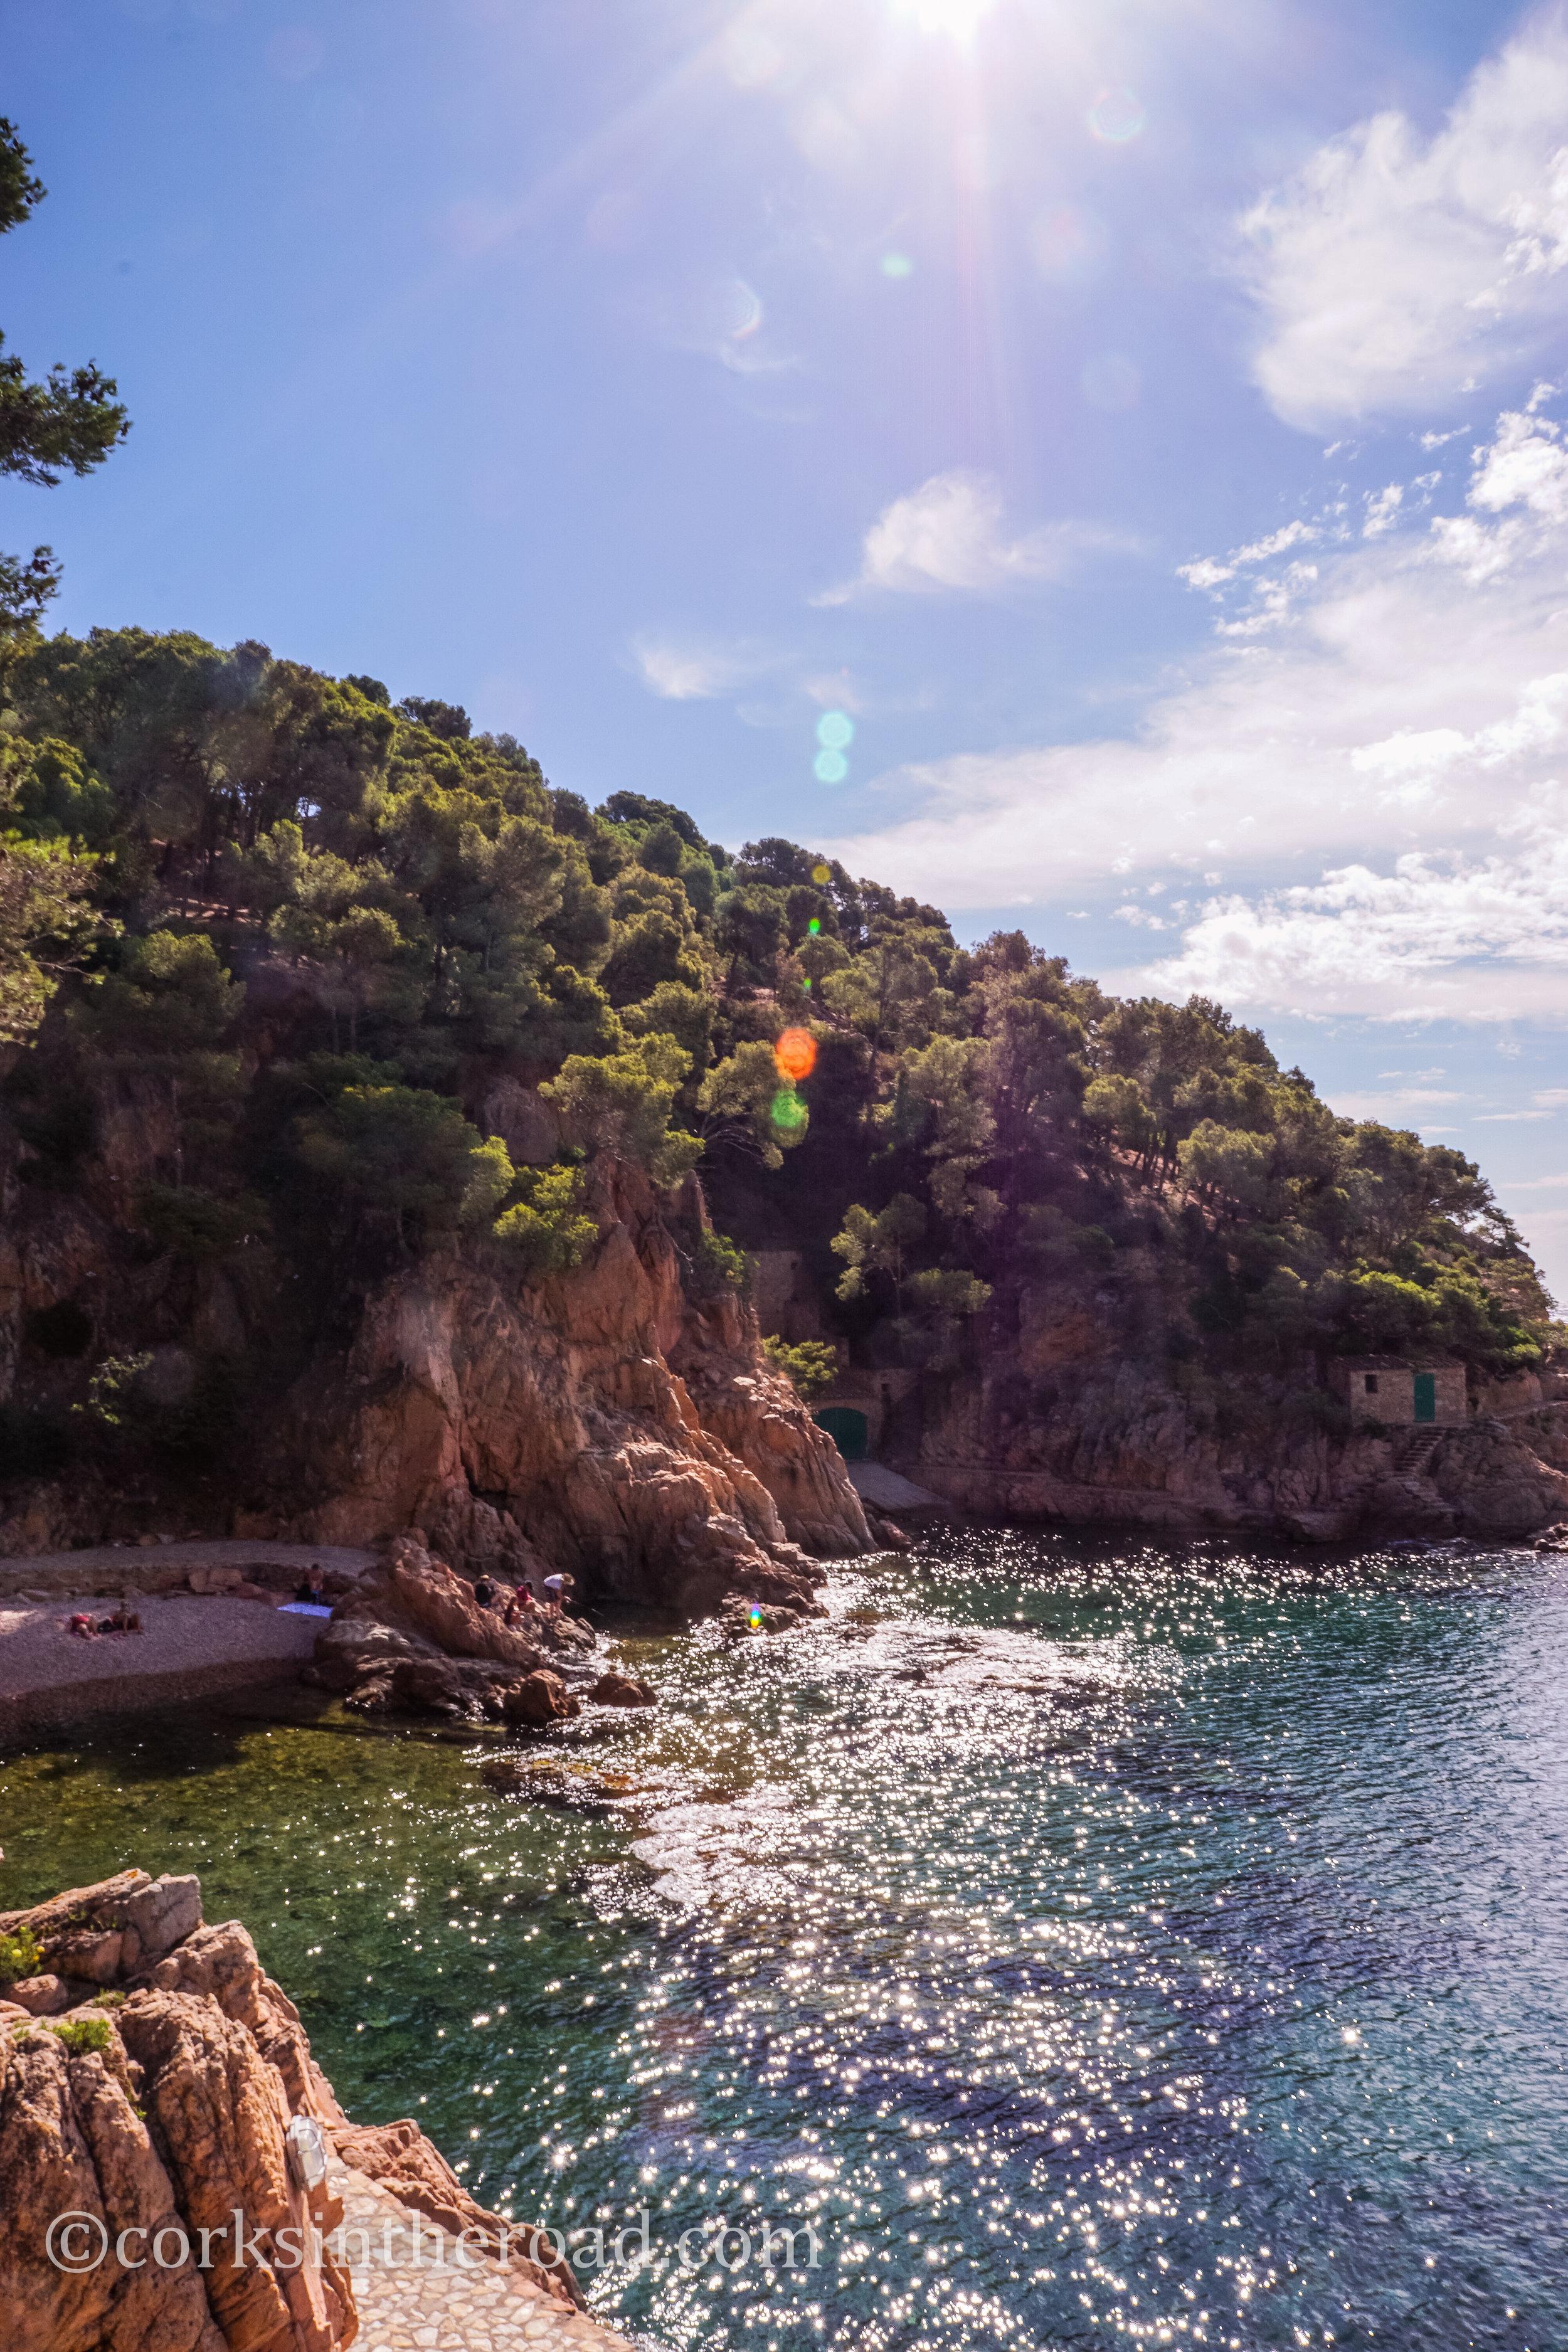 20160810Barcelona, Corksintheroad, Costa Brava, Costa Brava Landscape-10.jpg